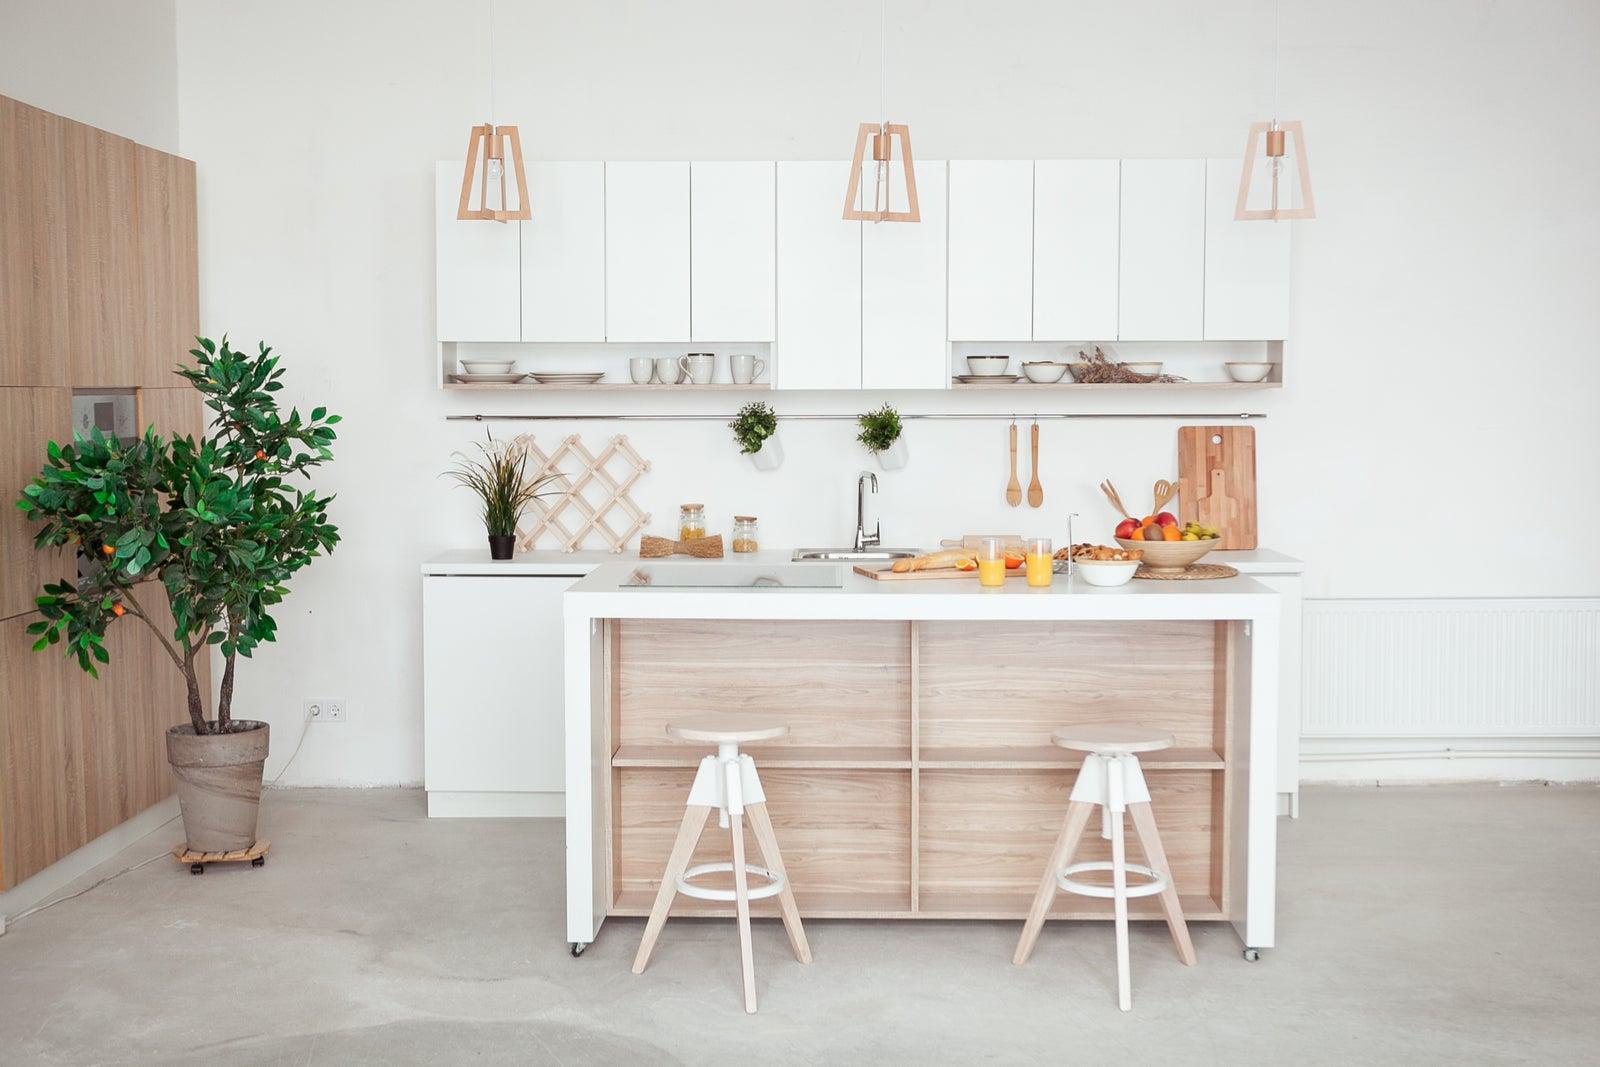 Cocinas en pisos peque os ideas para sacarle el m ximo for Cocinas en espacios reducidos fotos